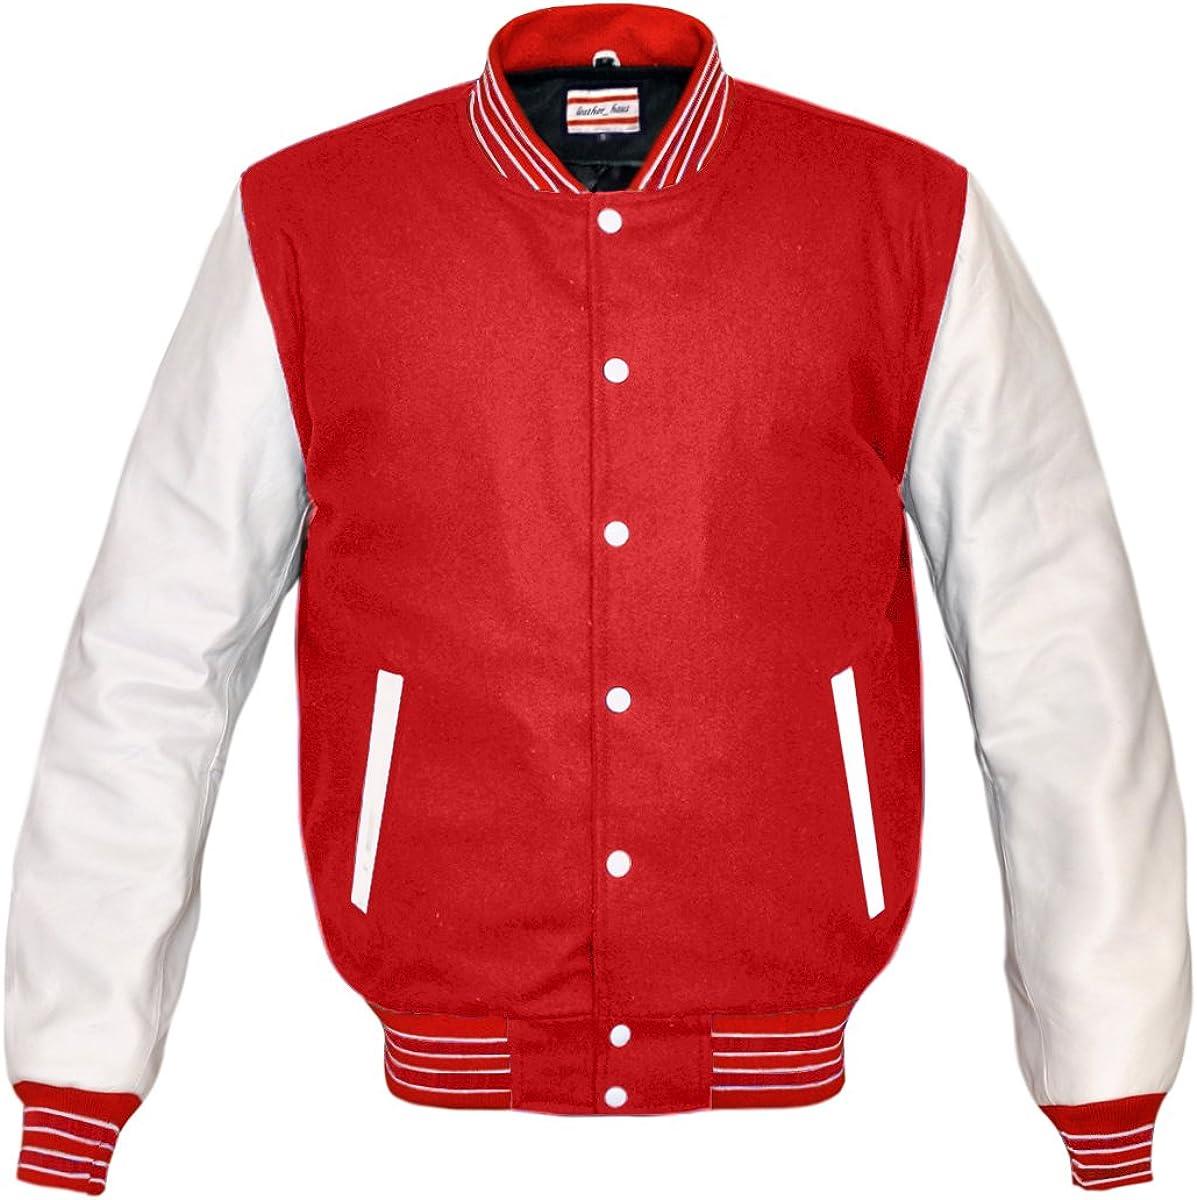 Superb Genuine White lowest price Leather Sleeve Varsity Letterman Houston Mall Me College